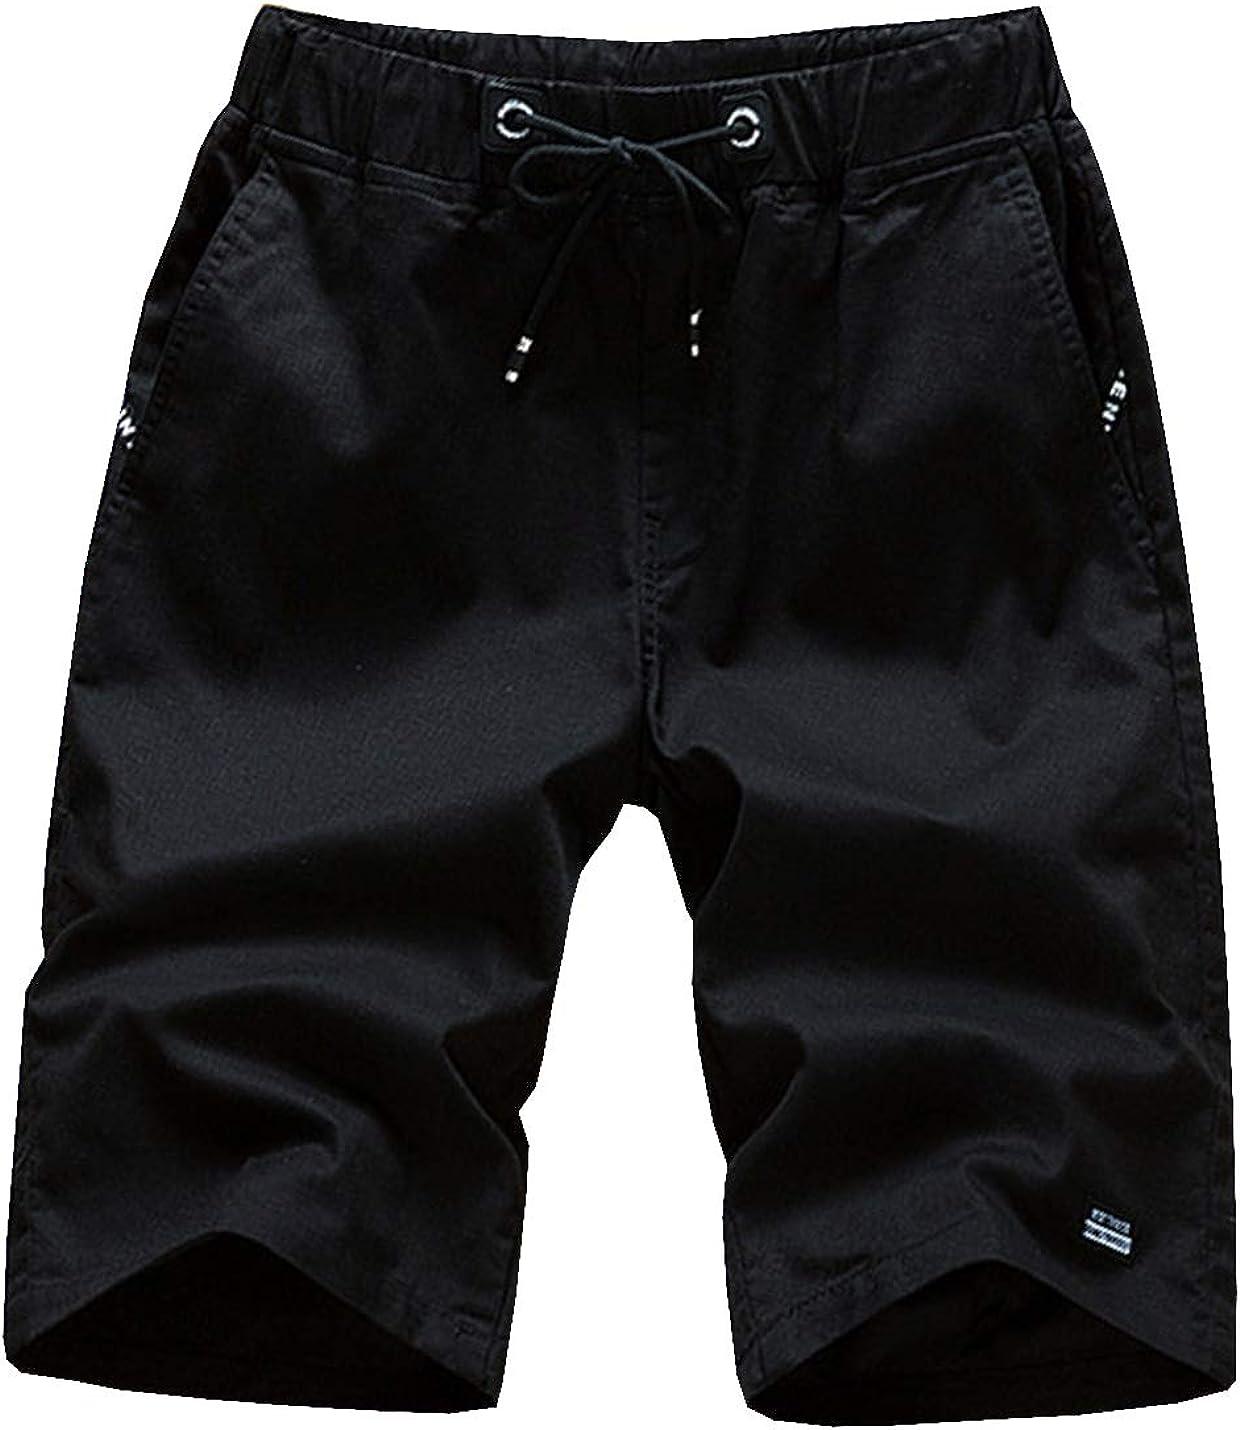 D.B.M Men's Casual Micro-Pleated Elastic Waist Drawstring Tie Cotton Shorts